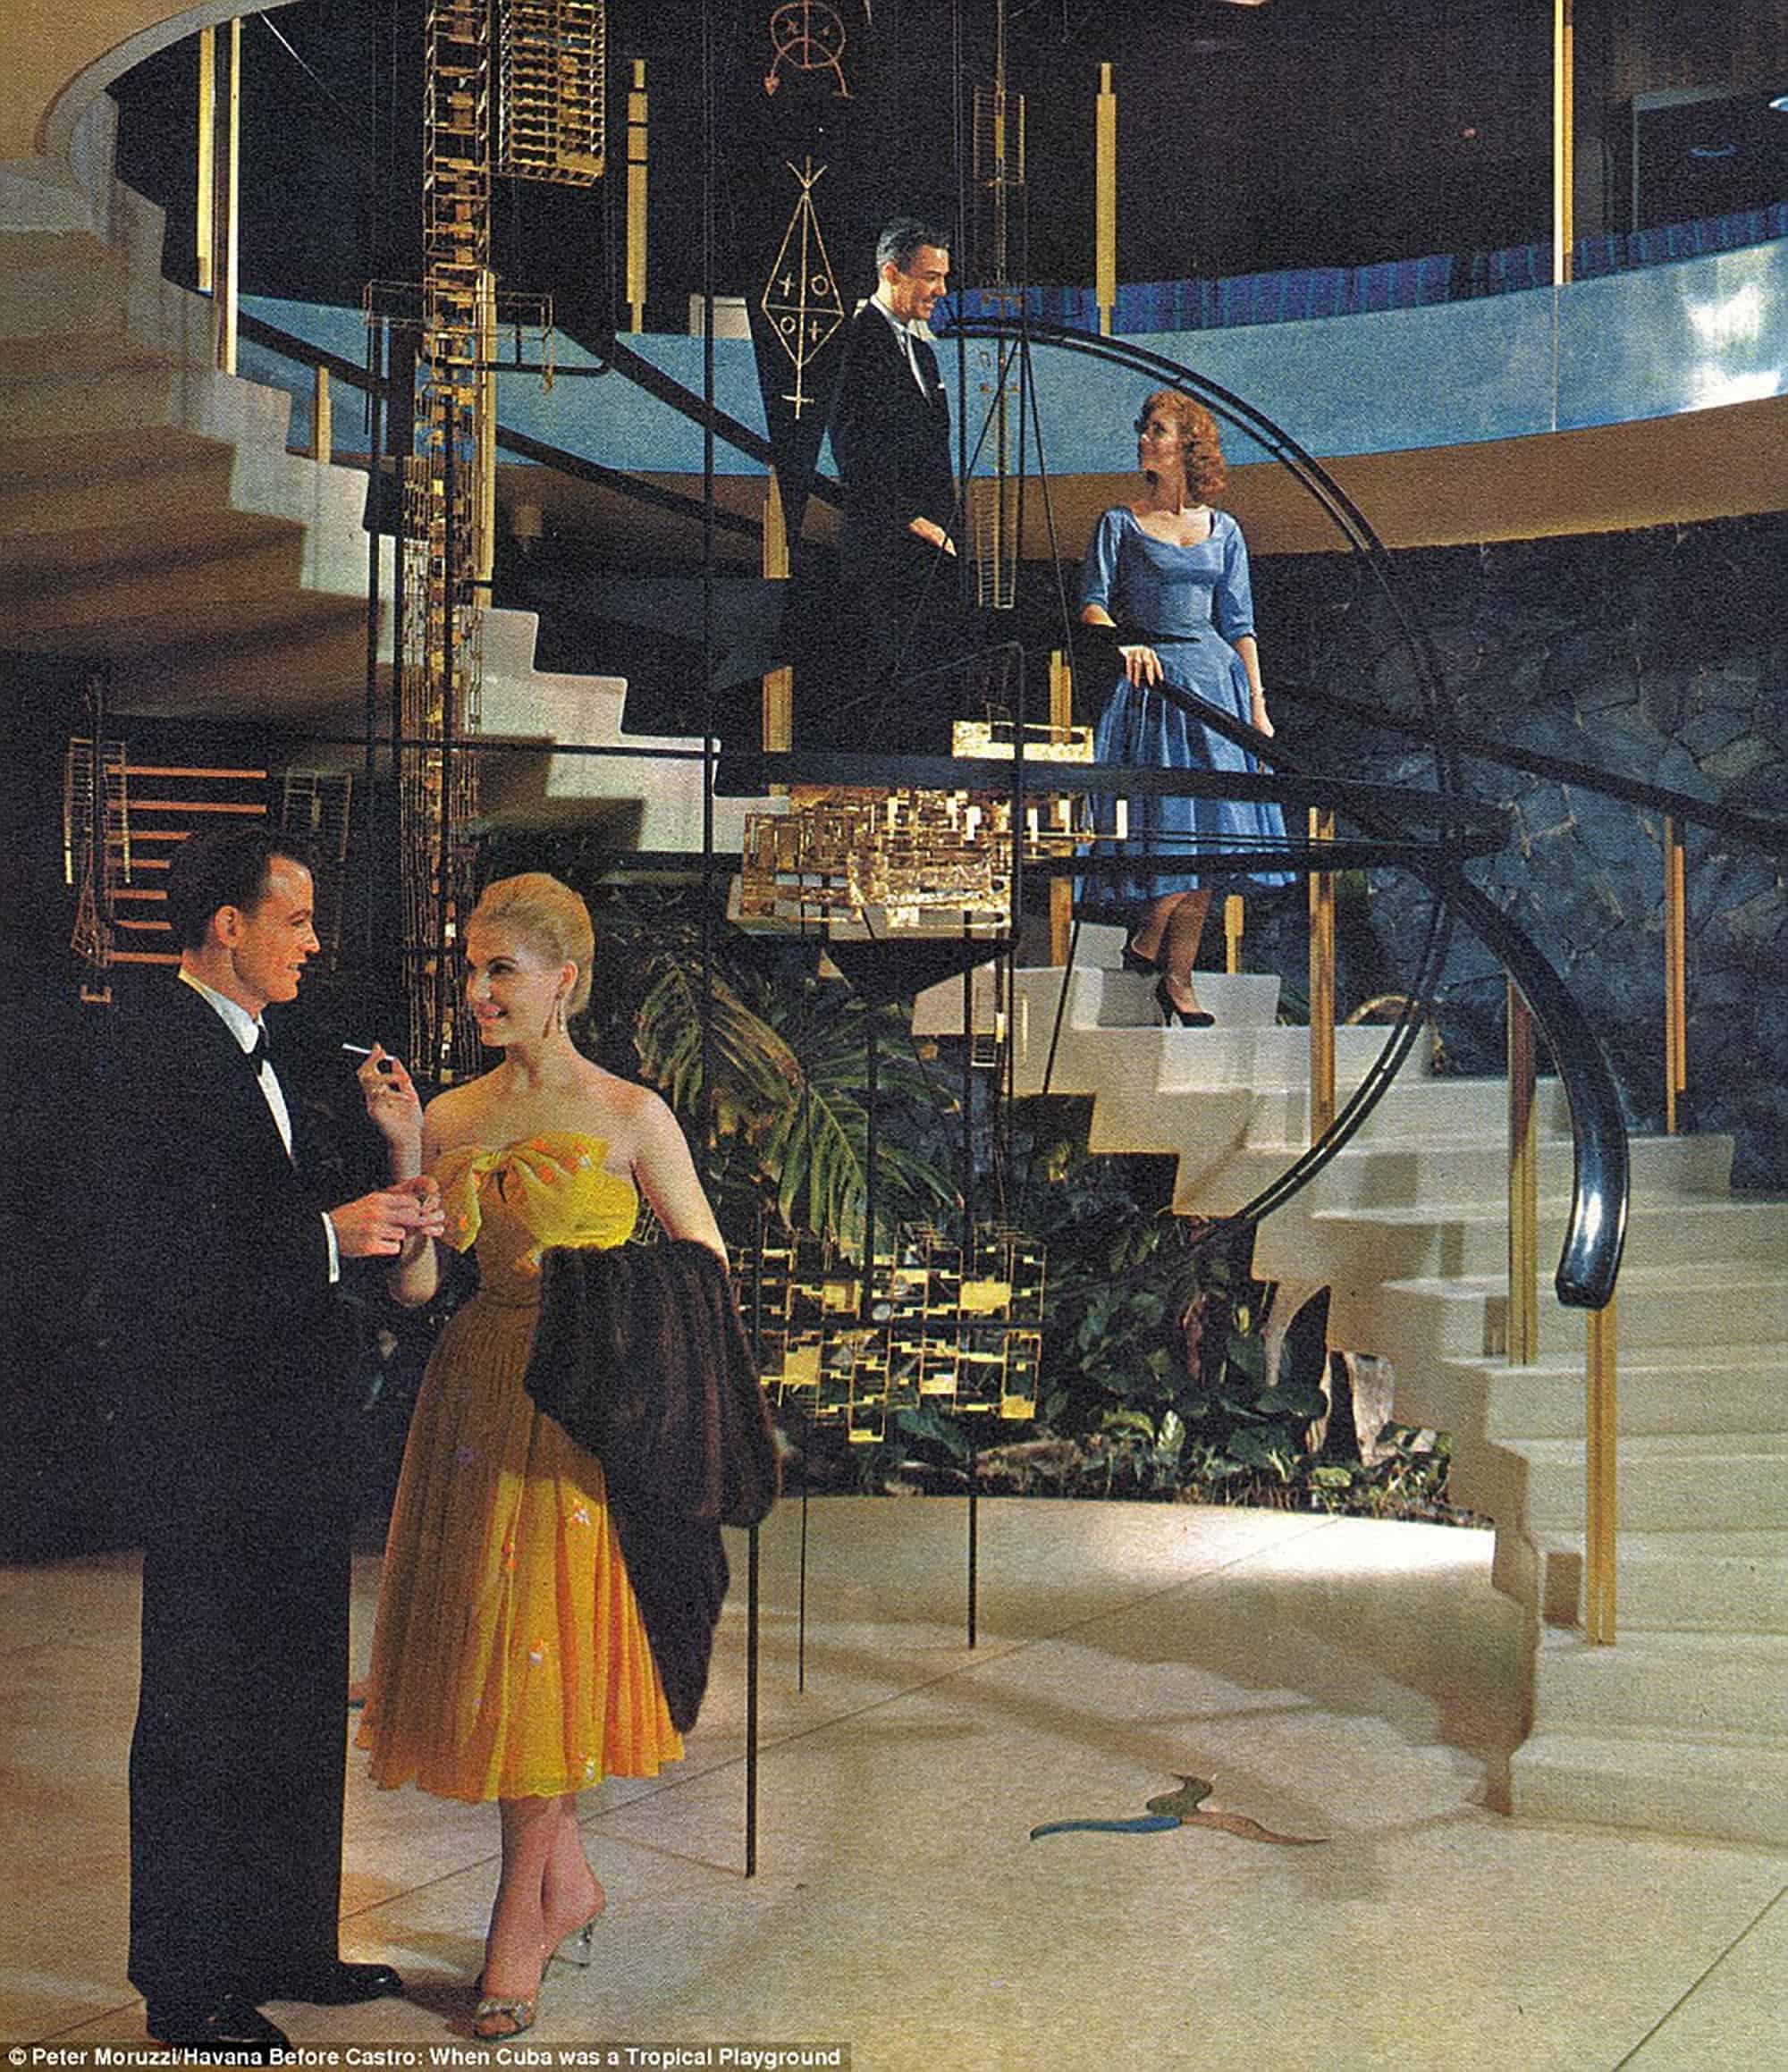 Havana Hilton, 1958